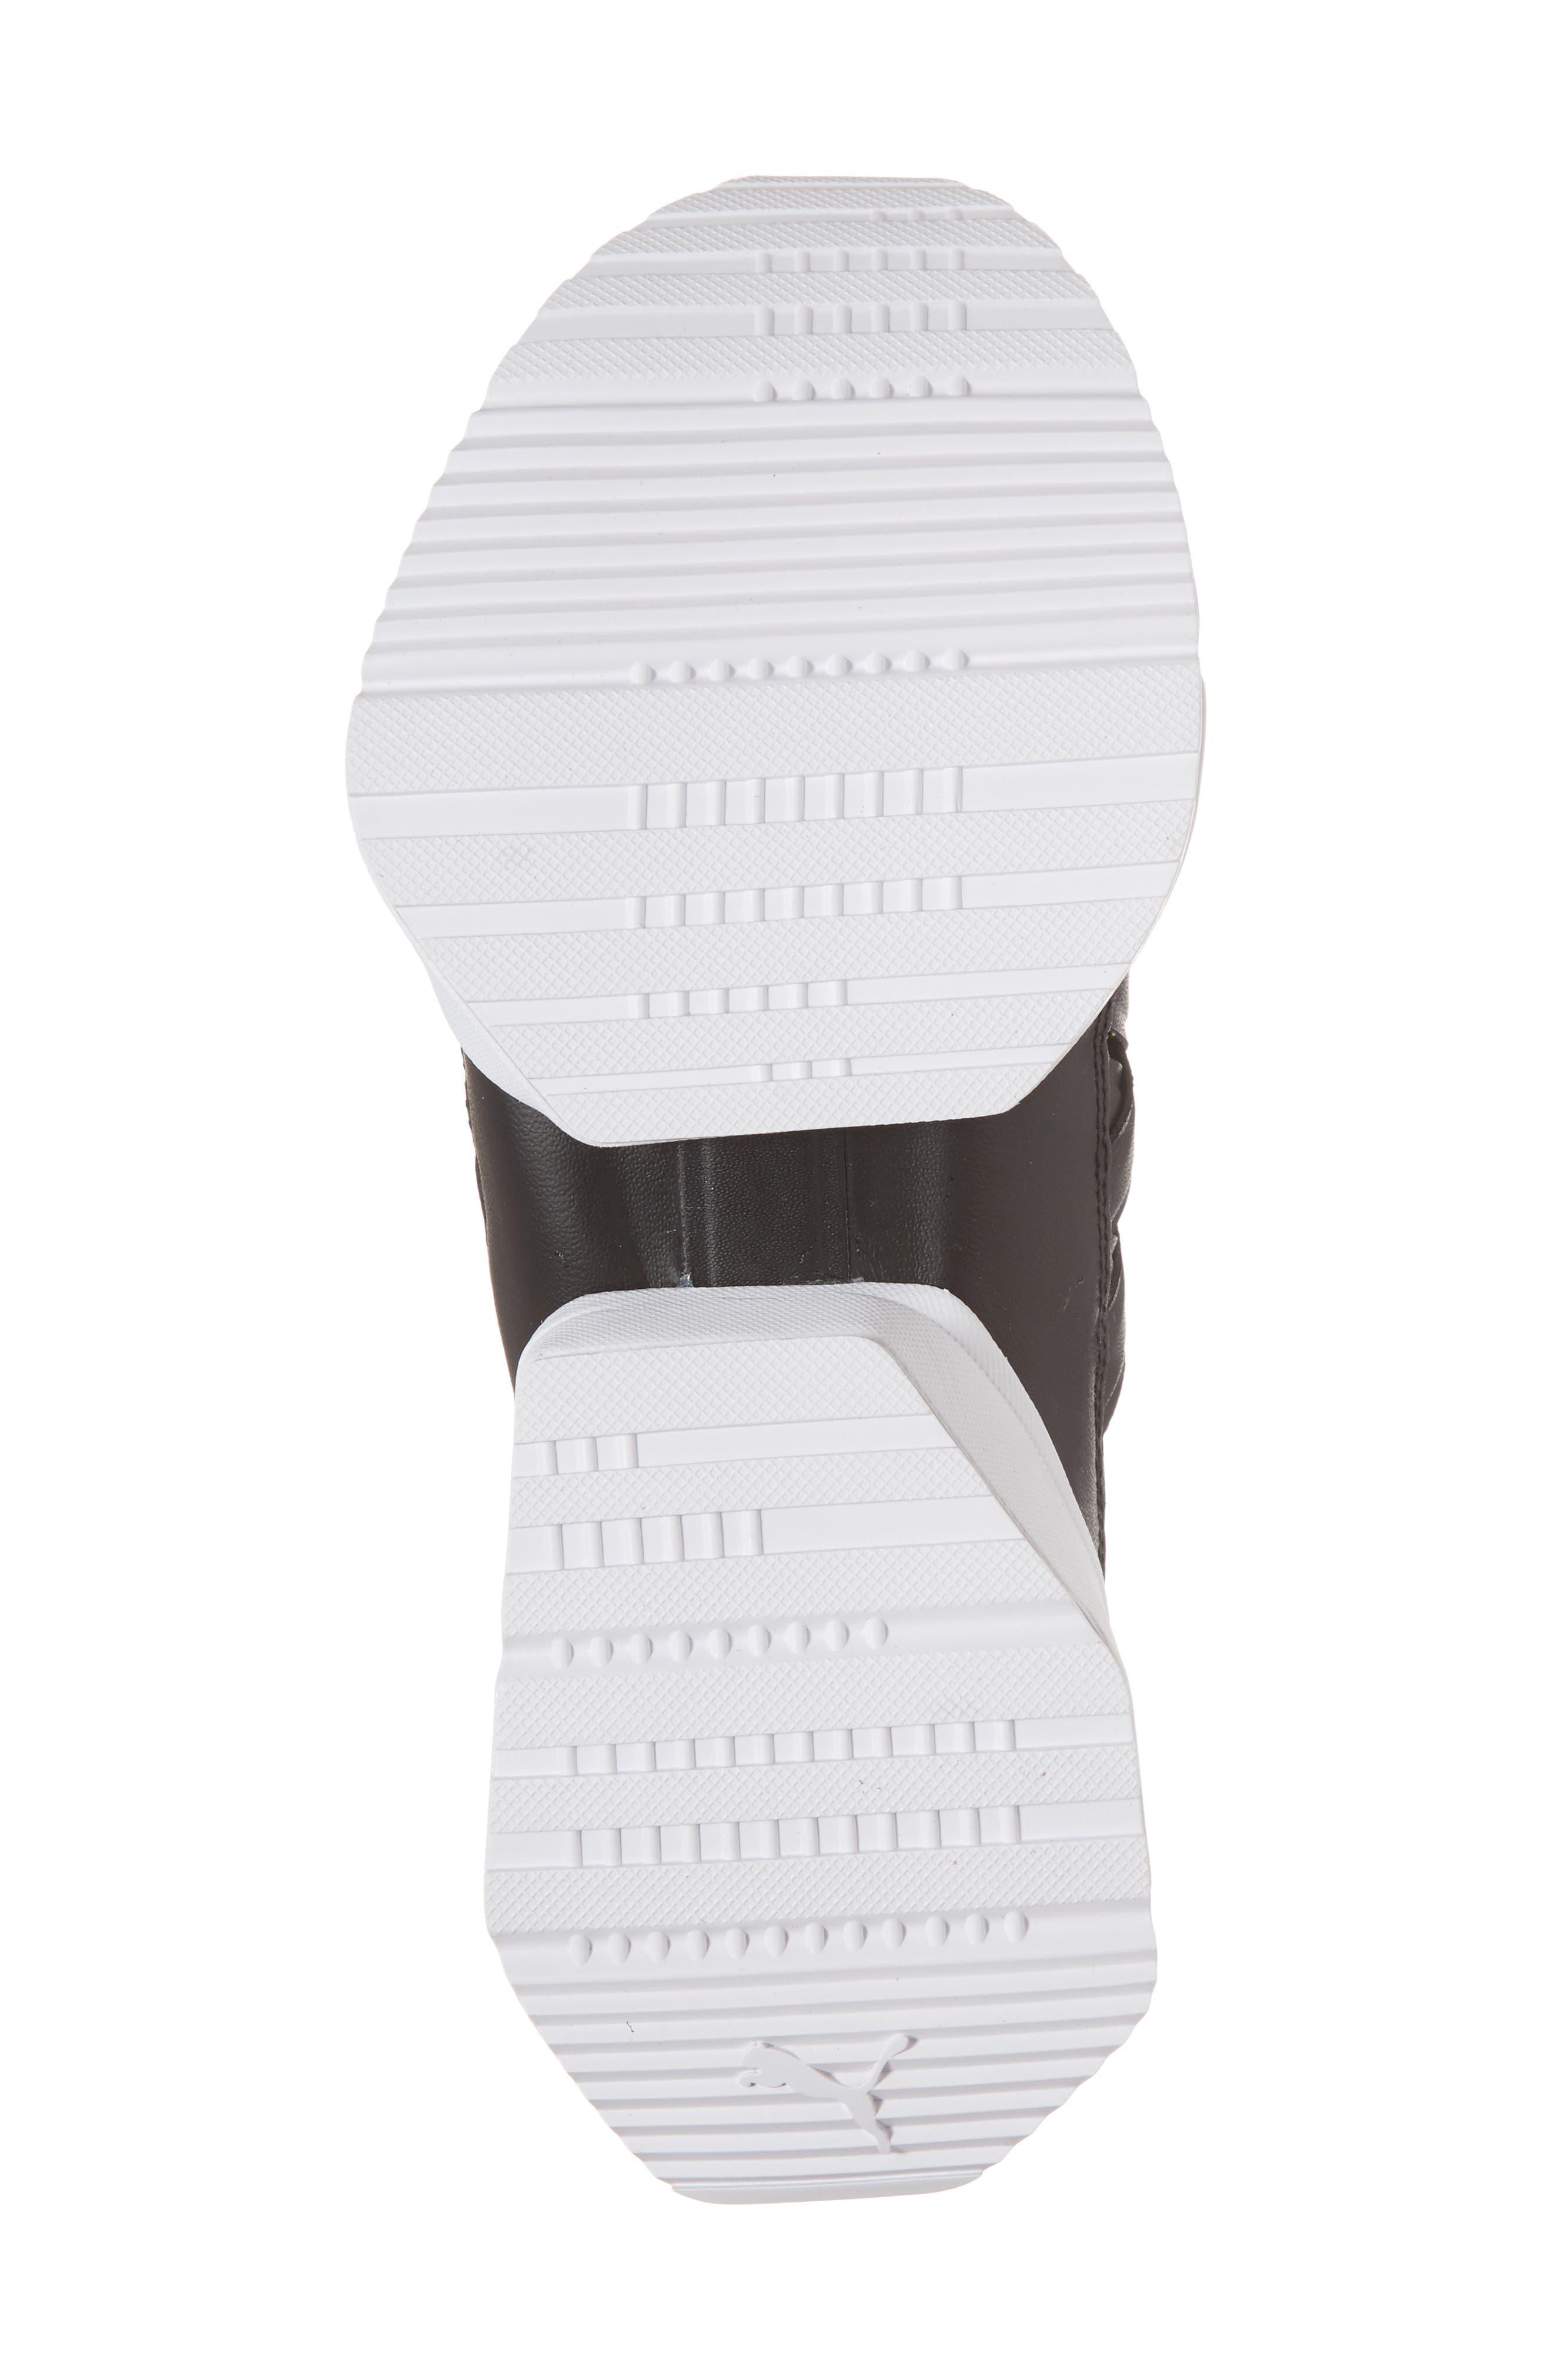 Muse Echo Satin En Pointe High Top Sneaker,                             Alternate thumbnail 6, color,                             Puma Black/ Puma White